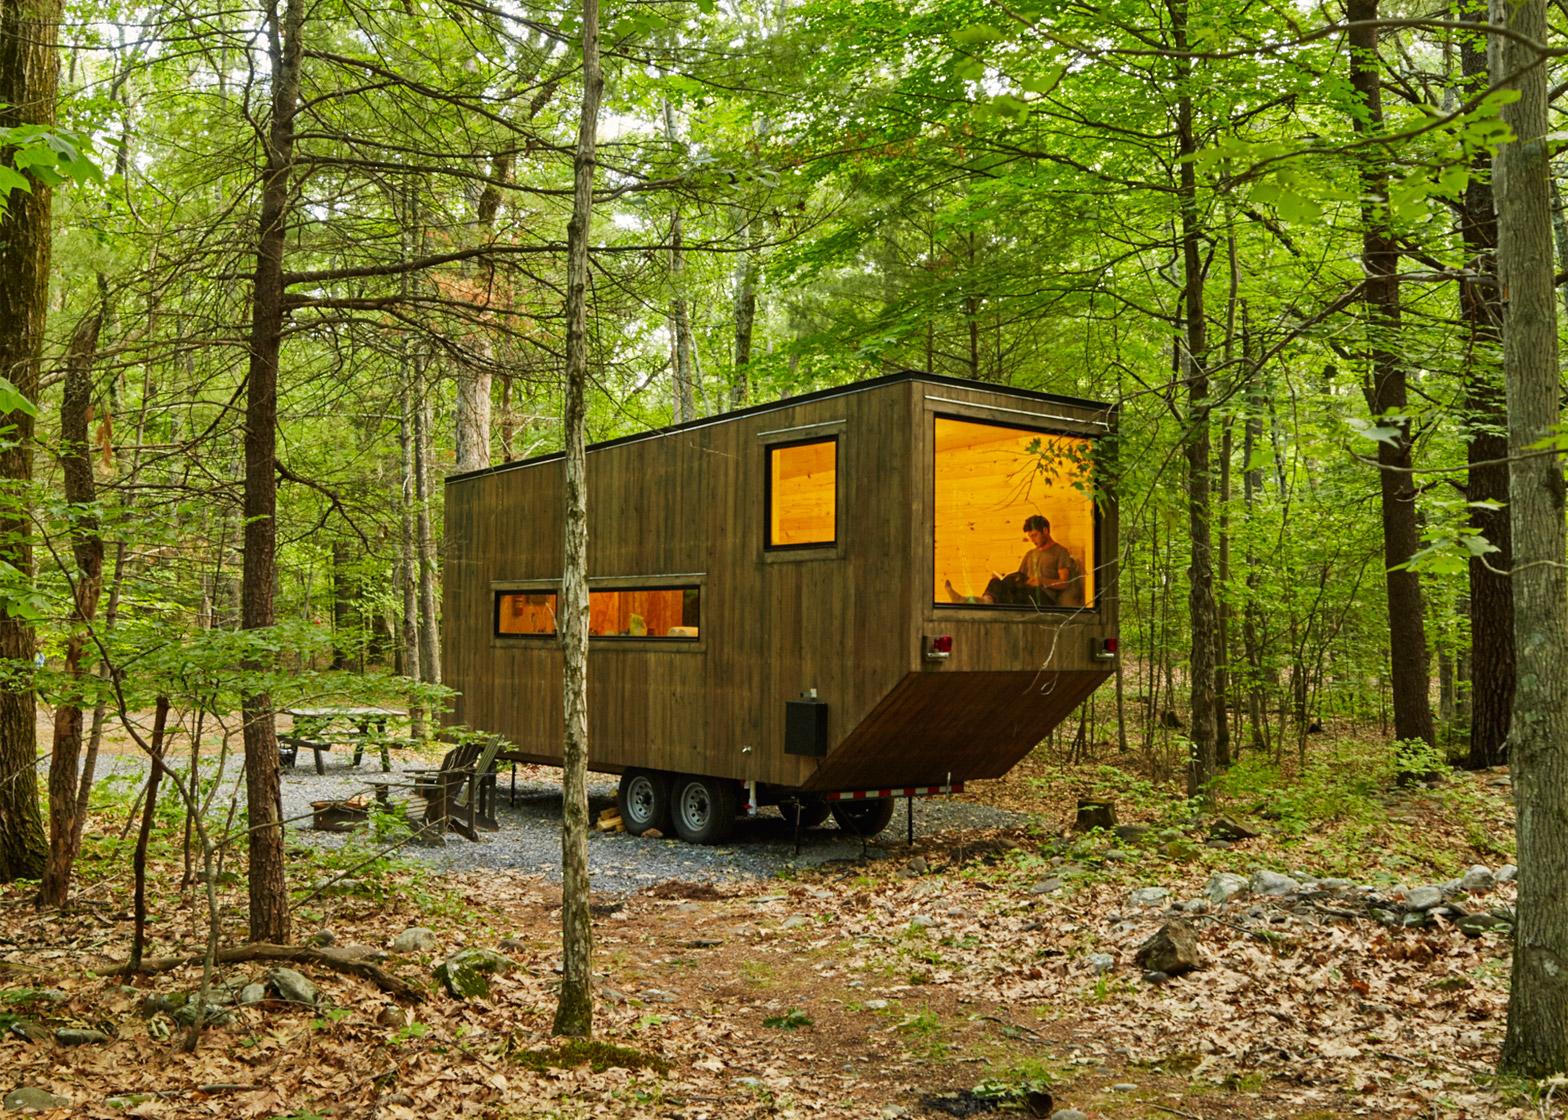 The Maisie Cabin near New York. Photograph by Roderick Aichinger